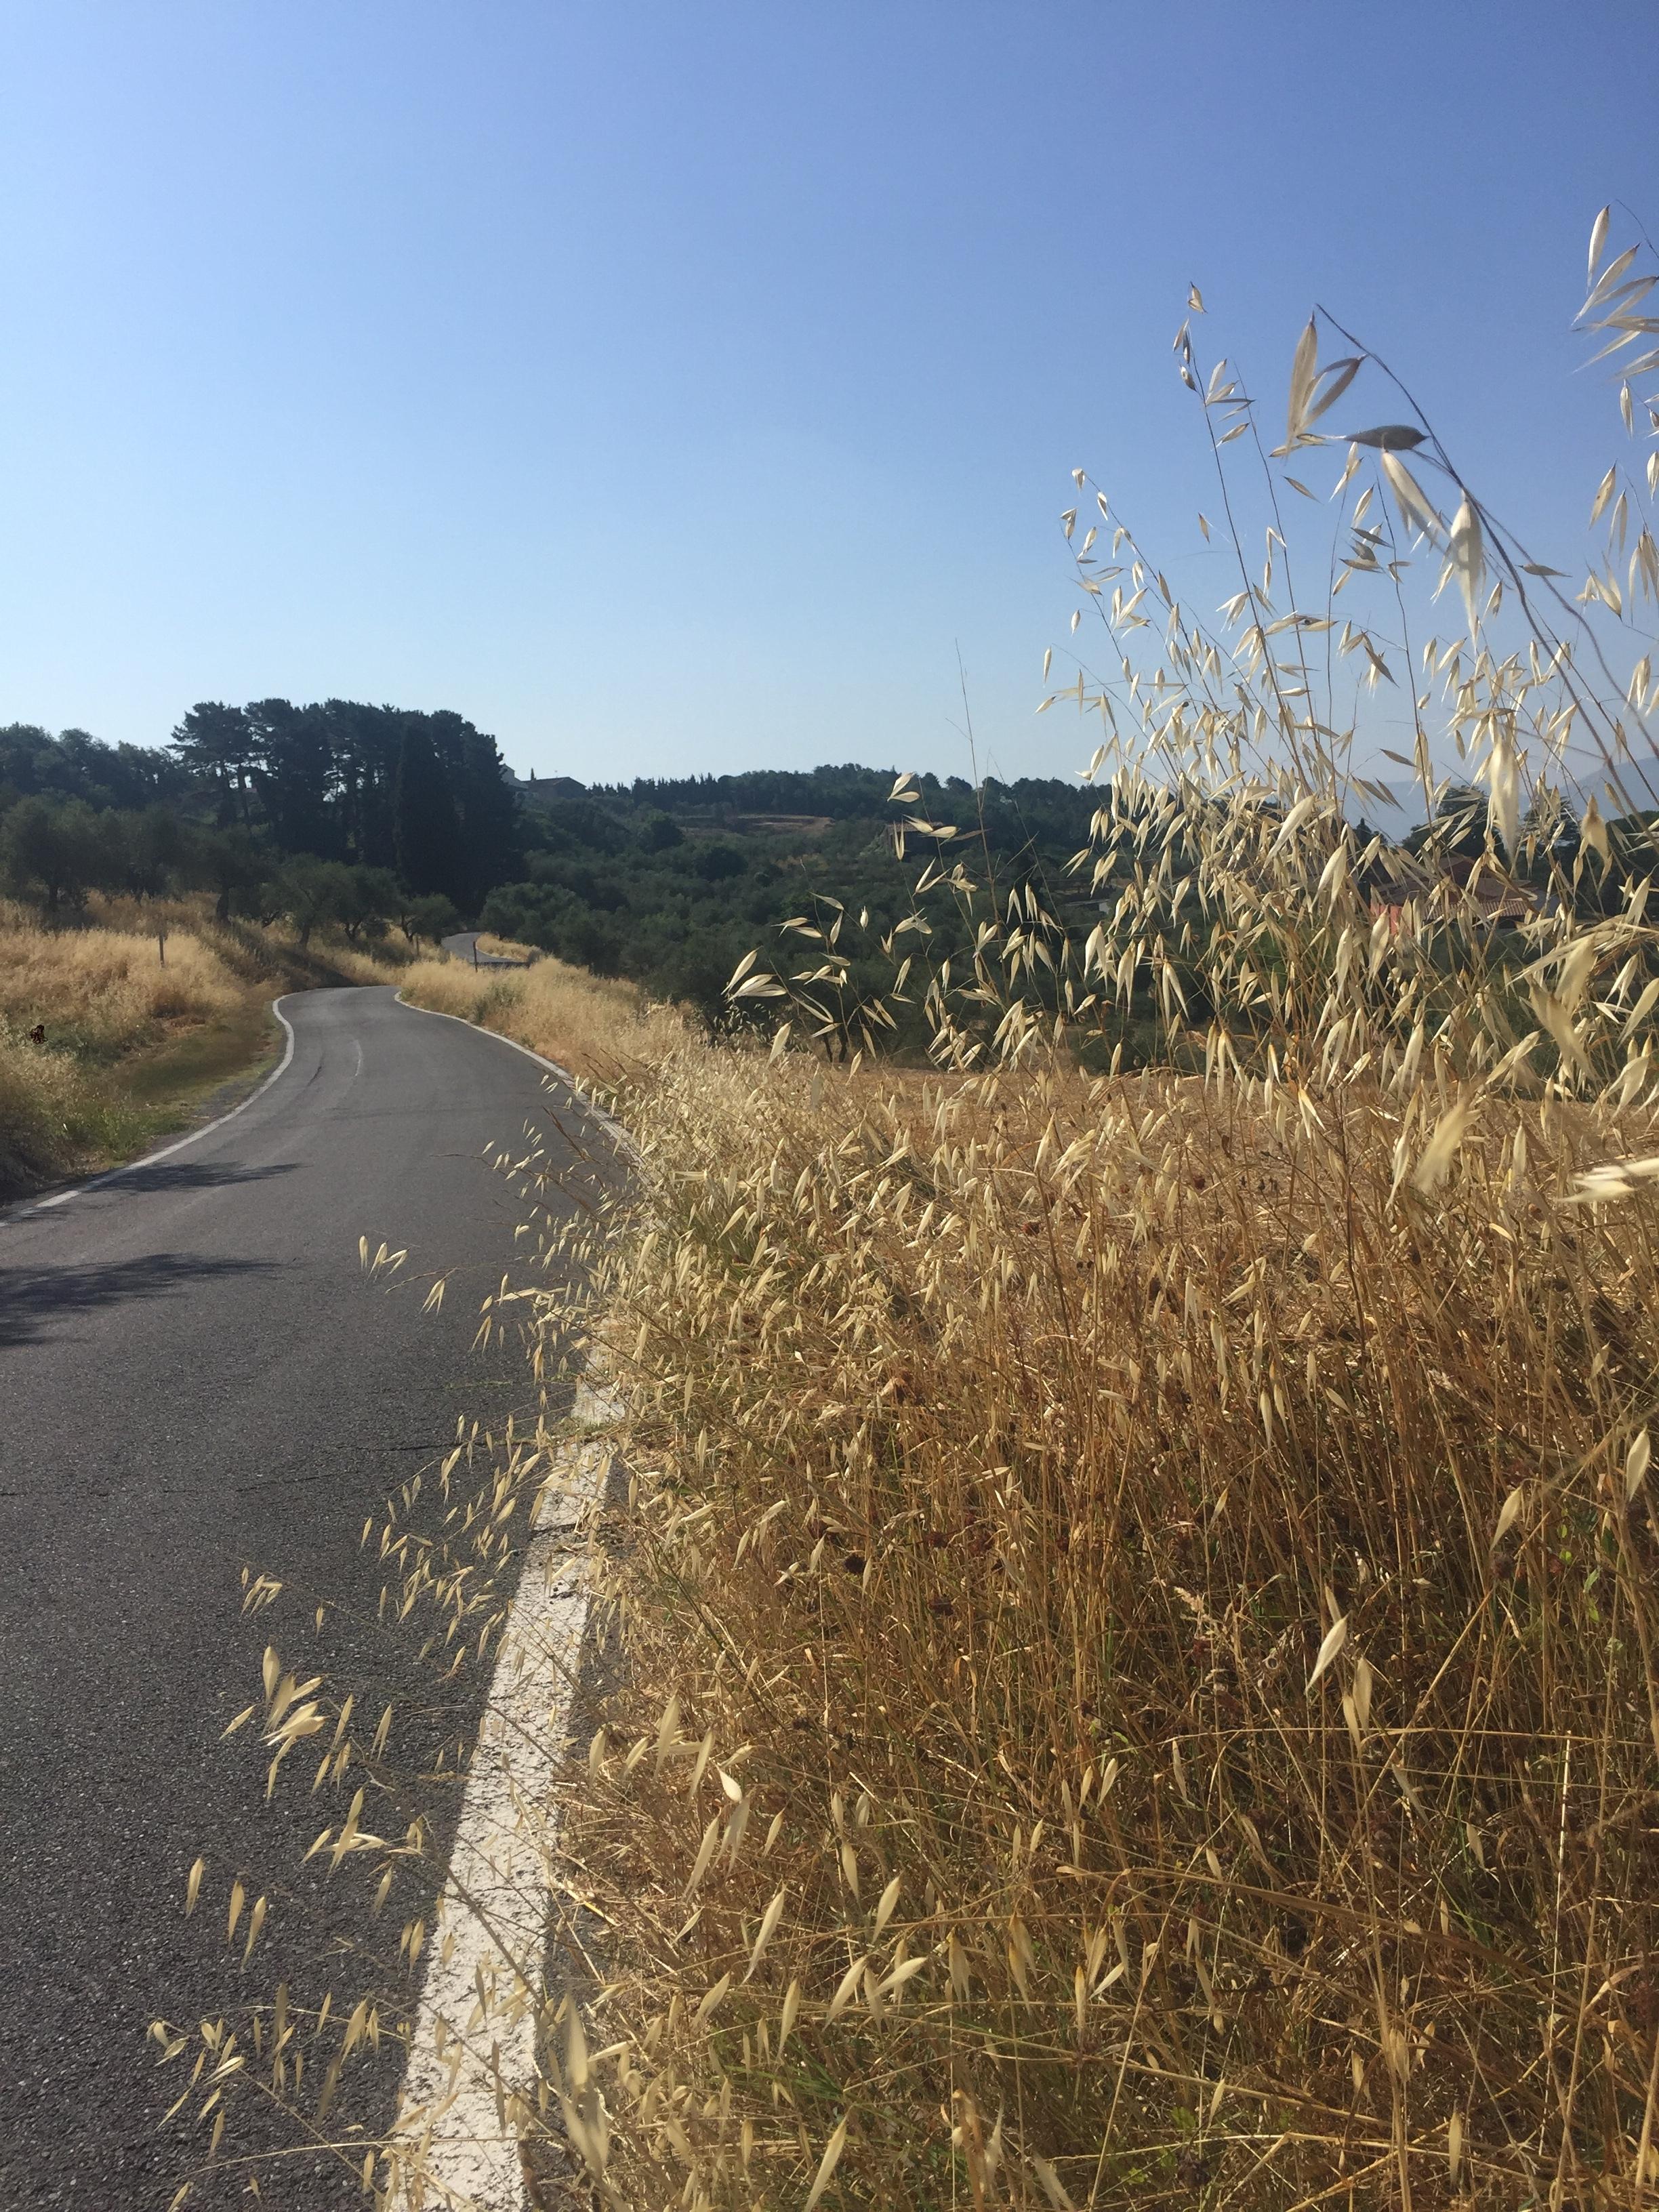 Those rolling hills…